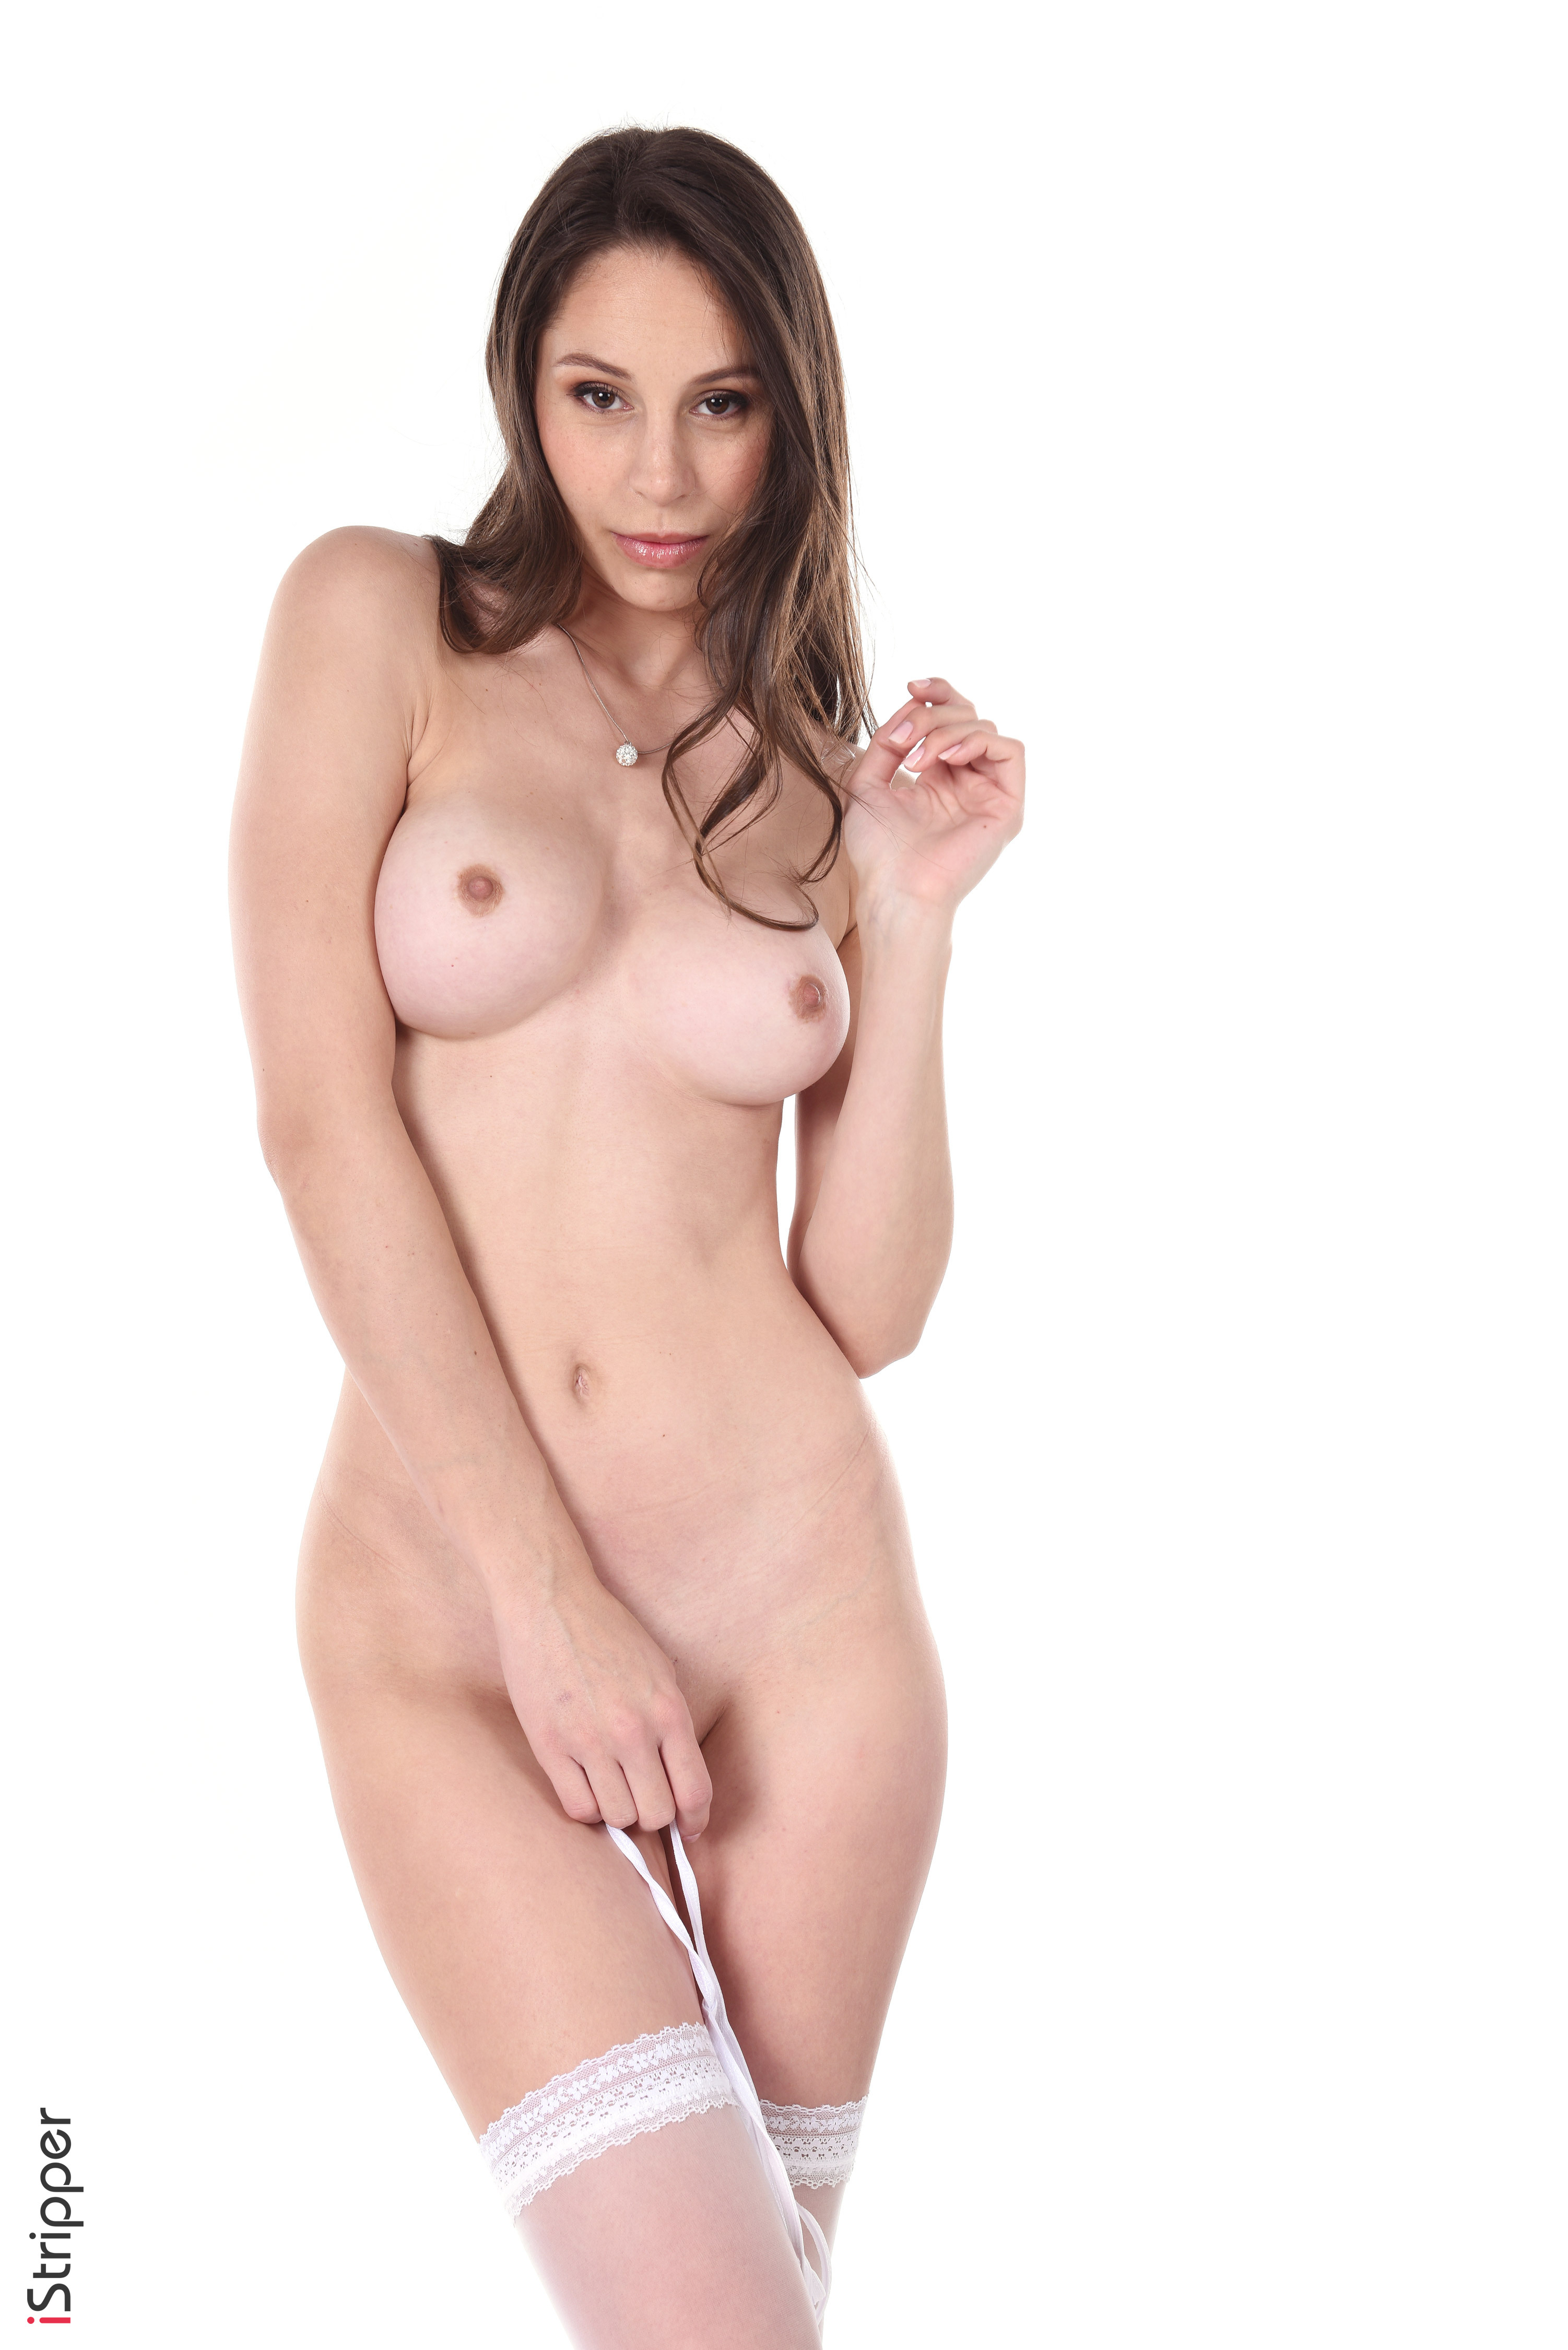 grace park nude wallpapers